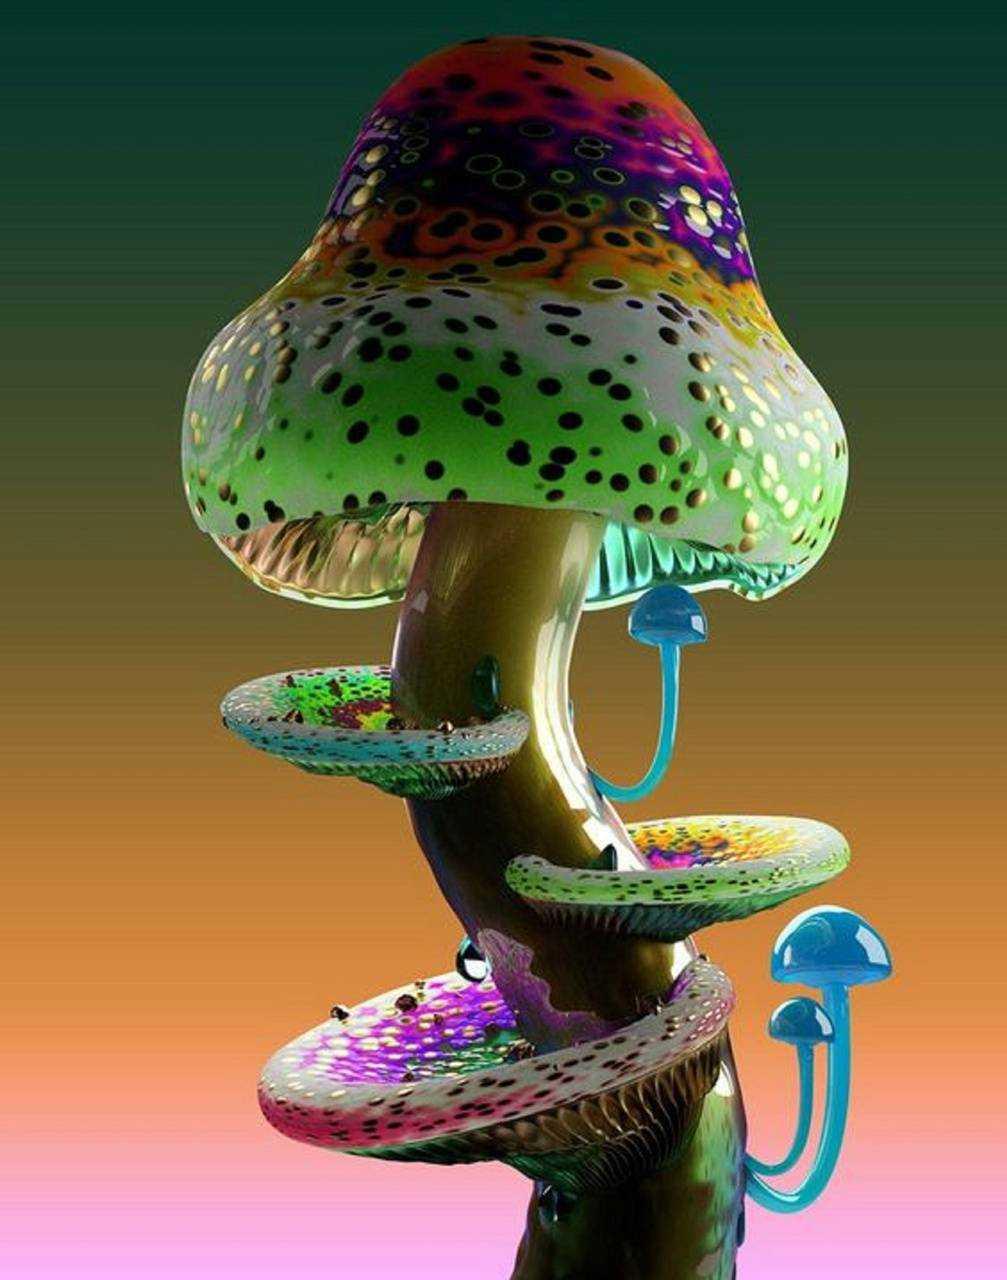 Mushroom Aesthetic Wallpapers Wallpaper Cave